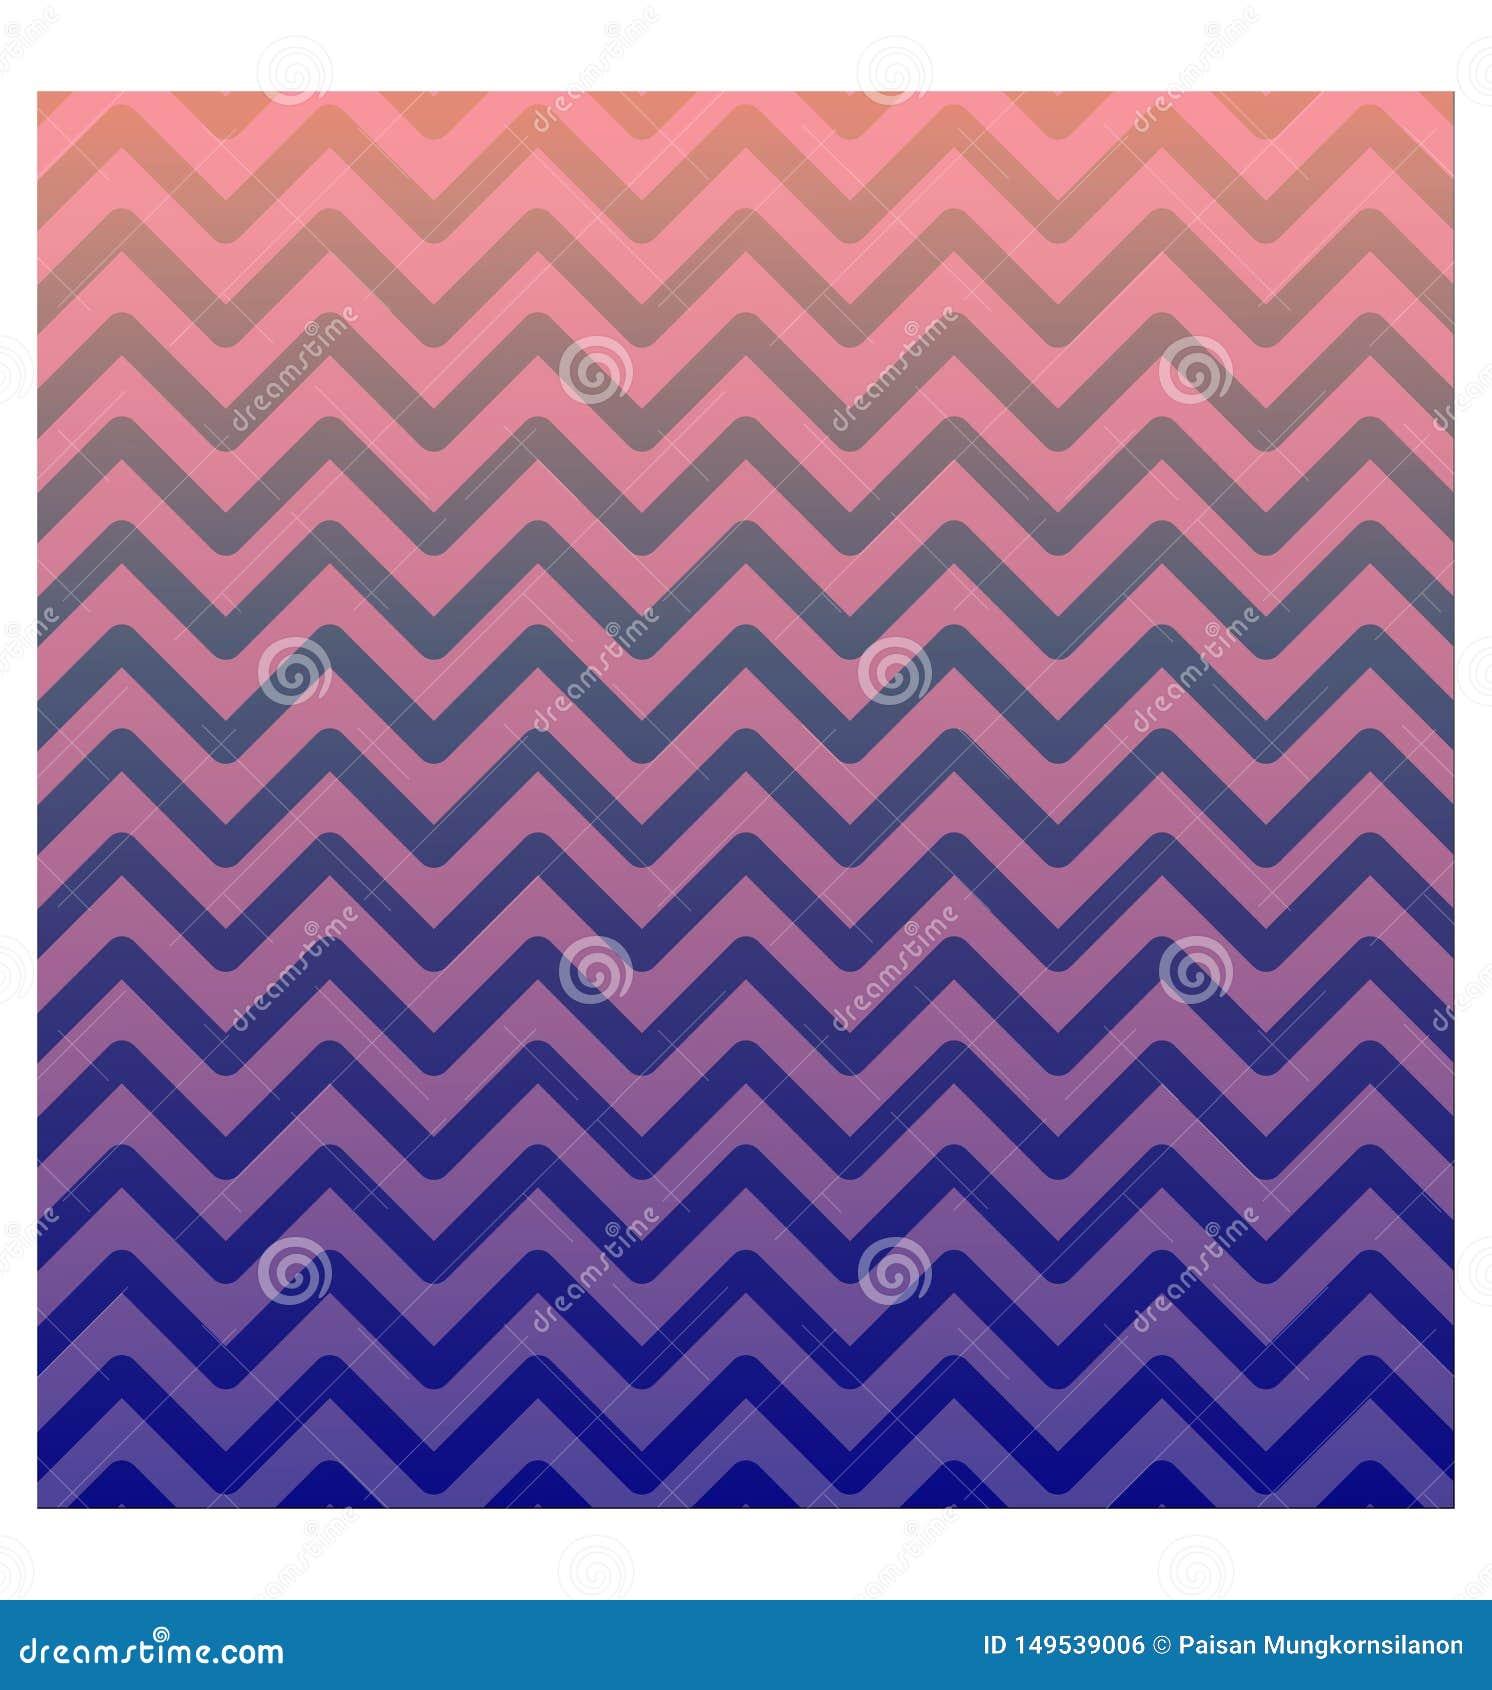 Kreatives abstraktes Artplakat Rosa-purpurroter Steigung Zickzack formt Hintergrund Gebrauchsfertig für Anzeigen, Social Media, P